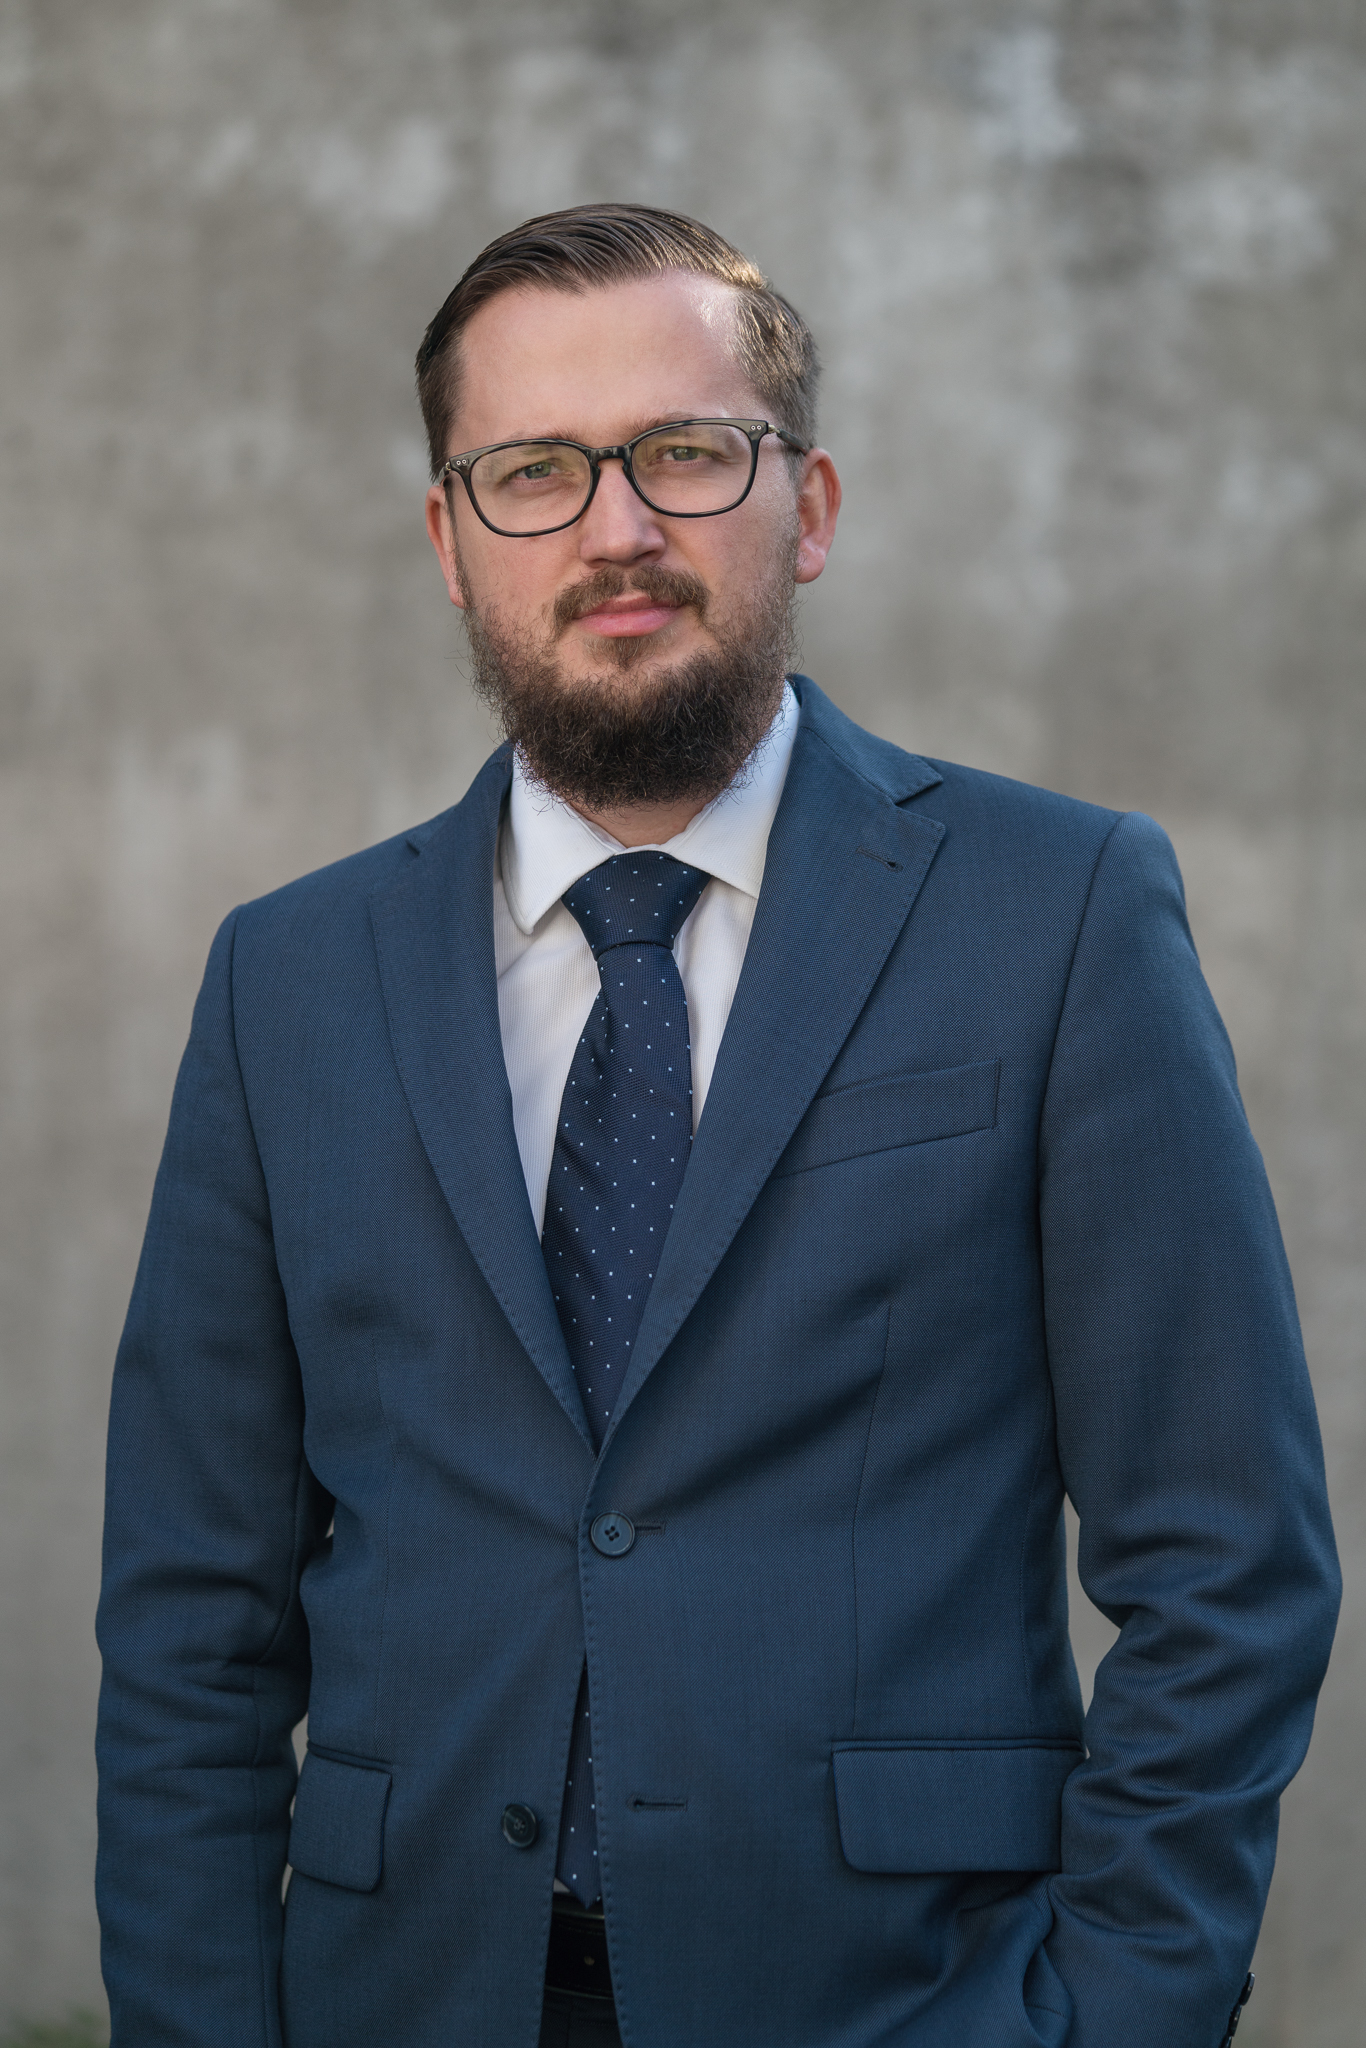 JUDr. MICHAL ŠILHÁNEK